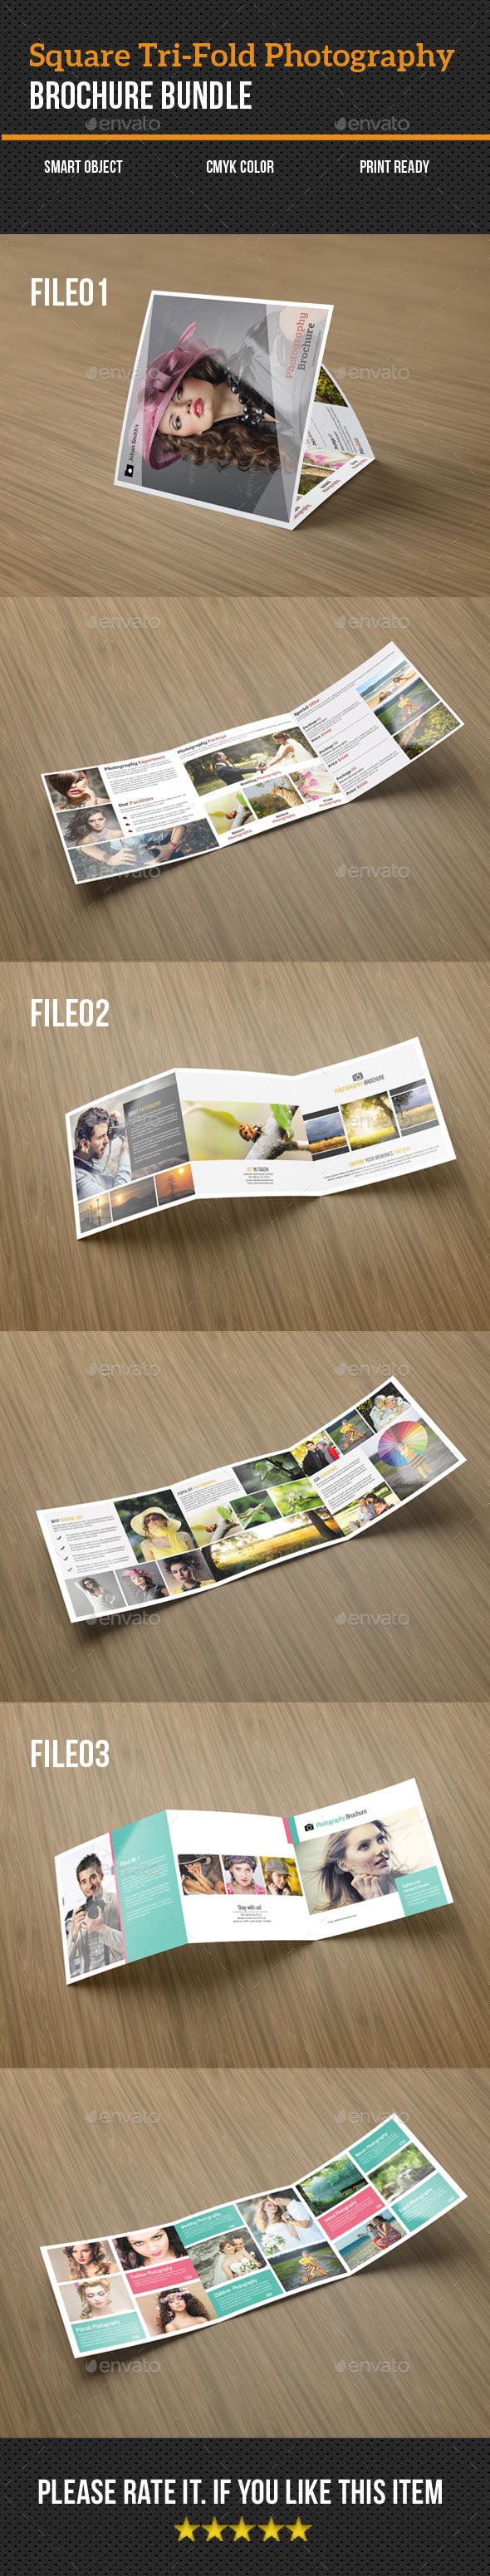 Square Tri-Fold Photography Brochure Bundle - Brochures Print Templates